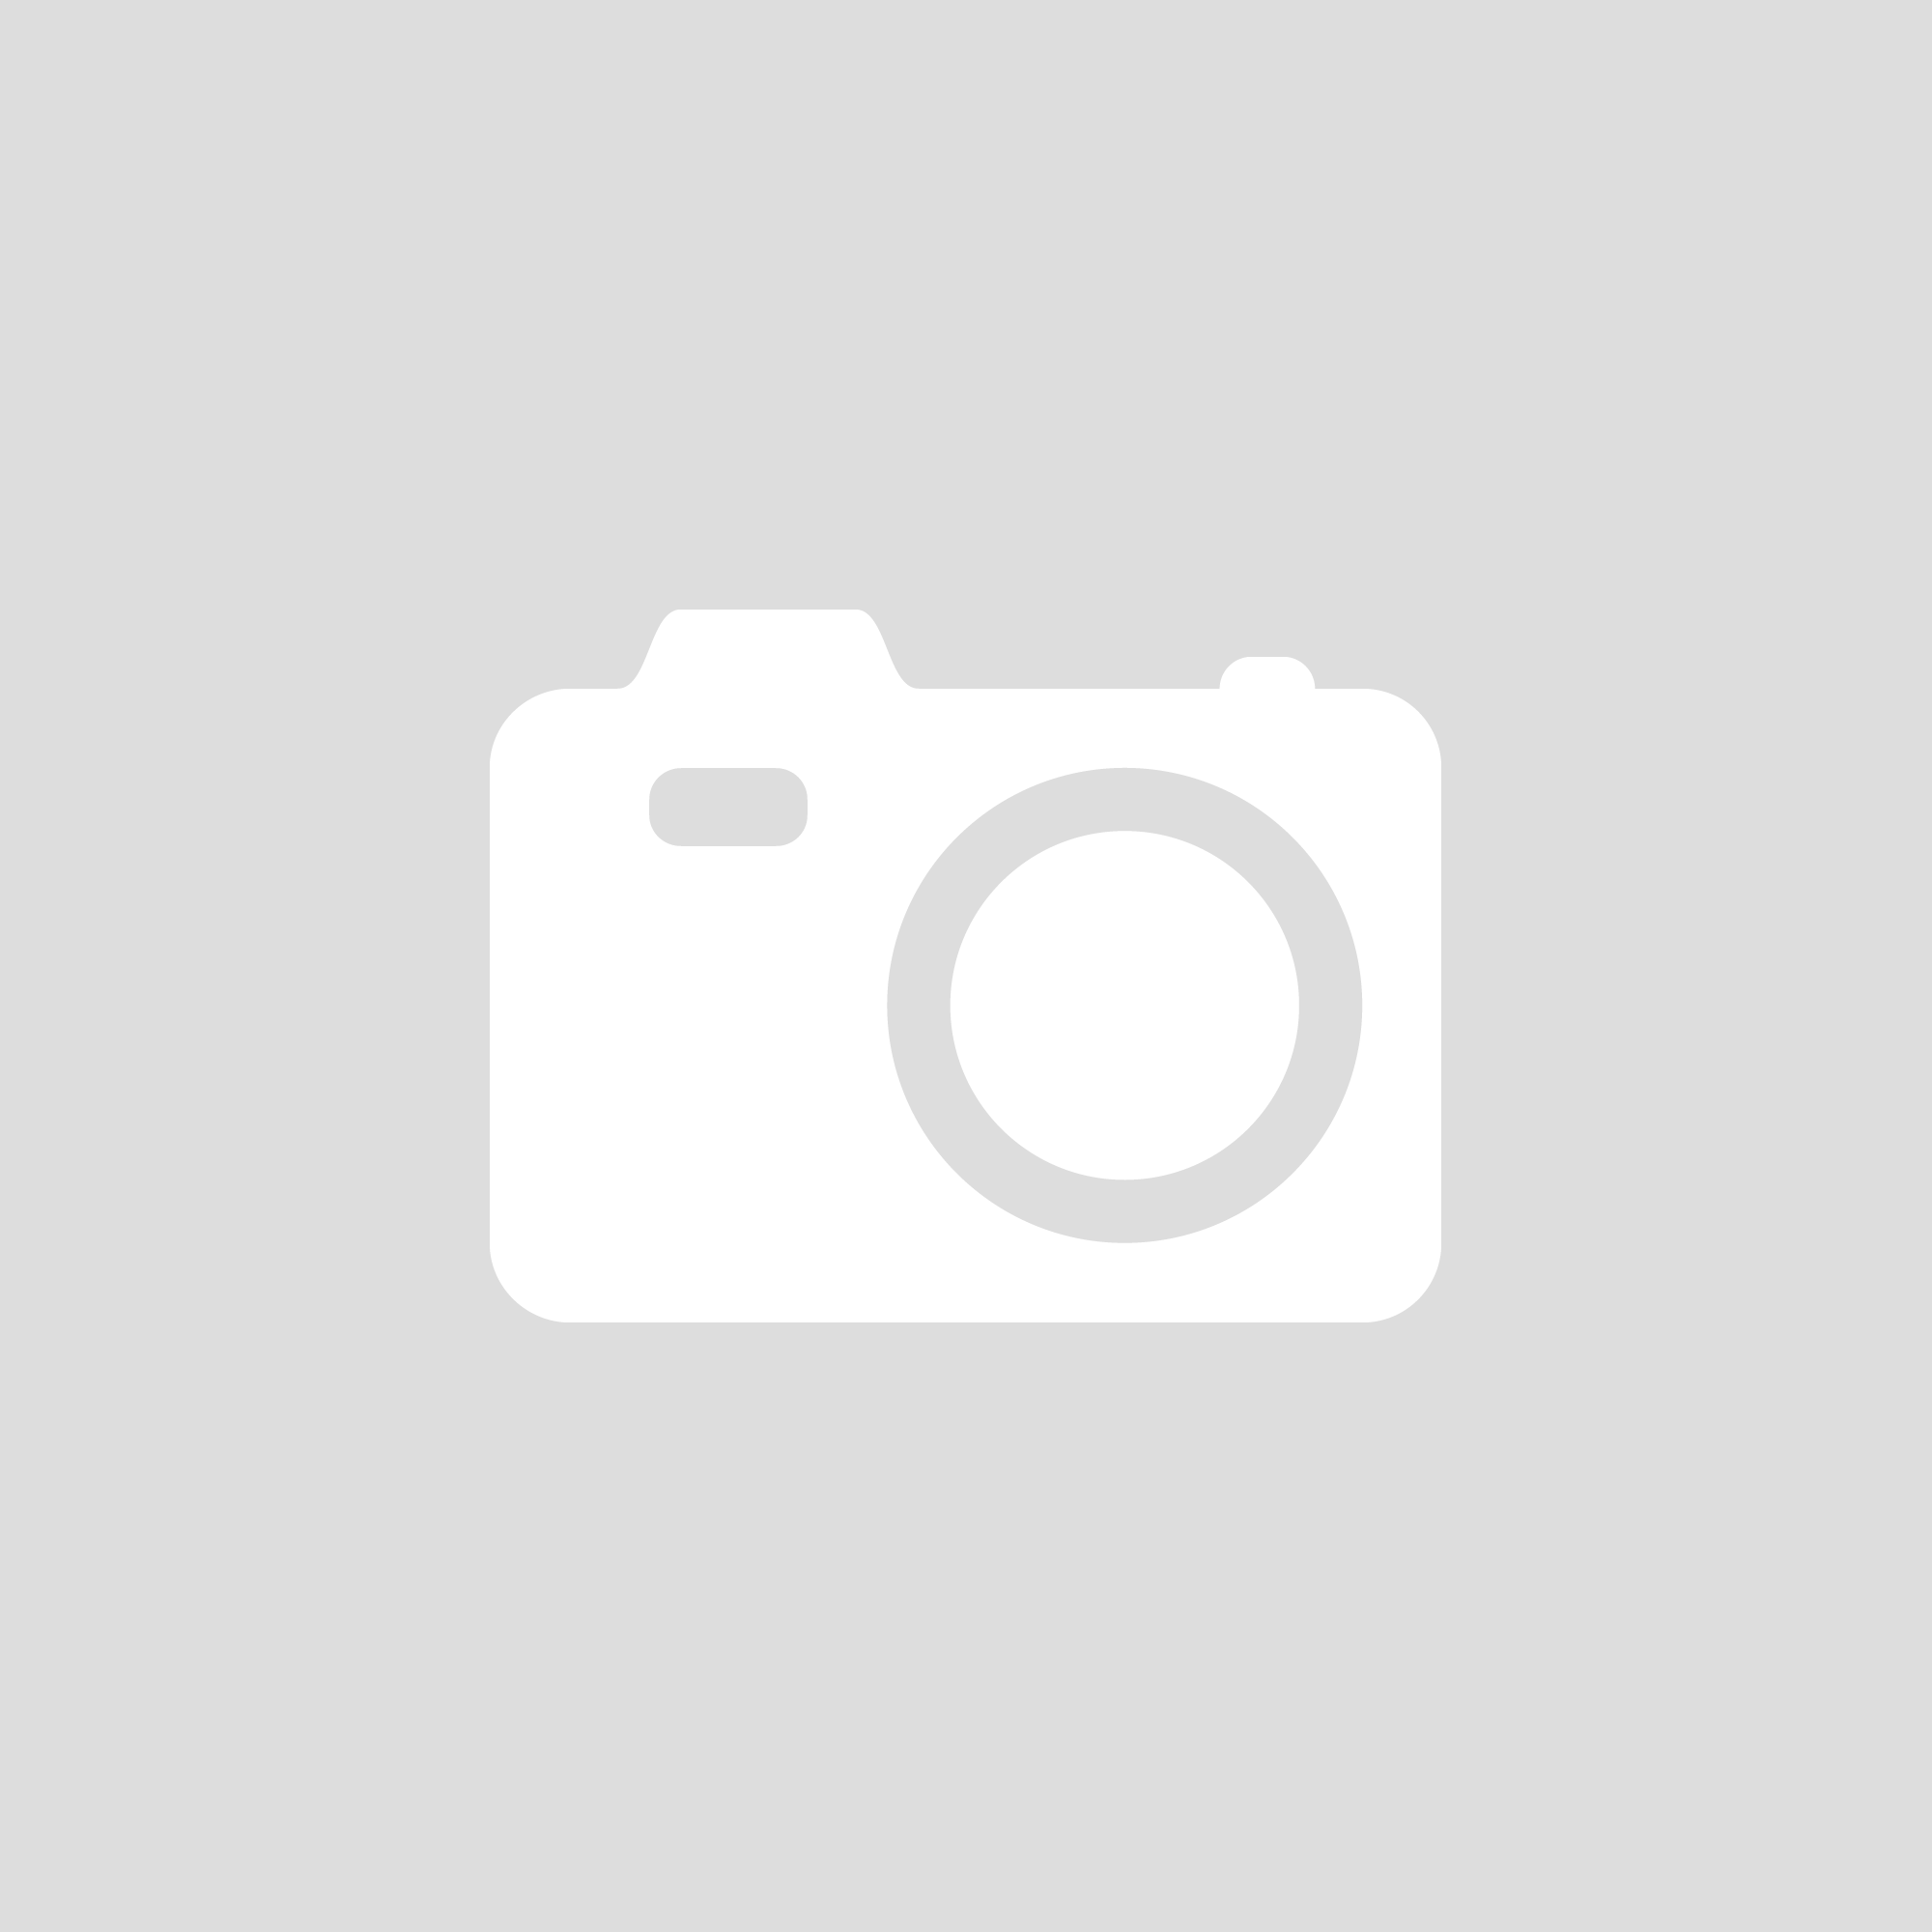 Crystal Tulip Damask Black / Red Wallpaper by Moda Black Label 245